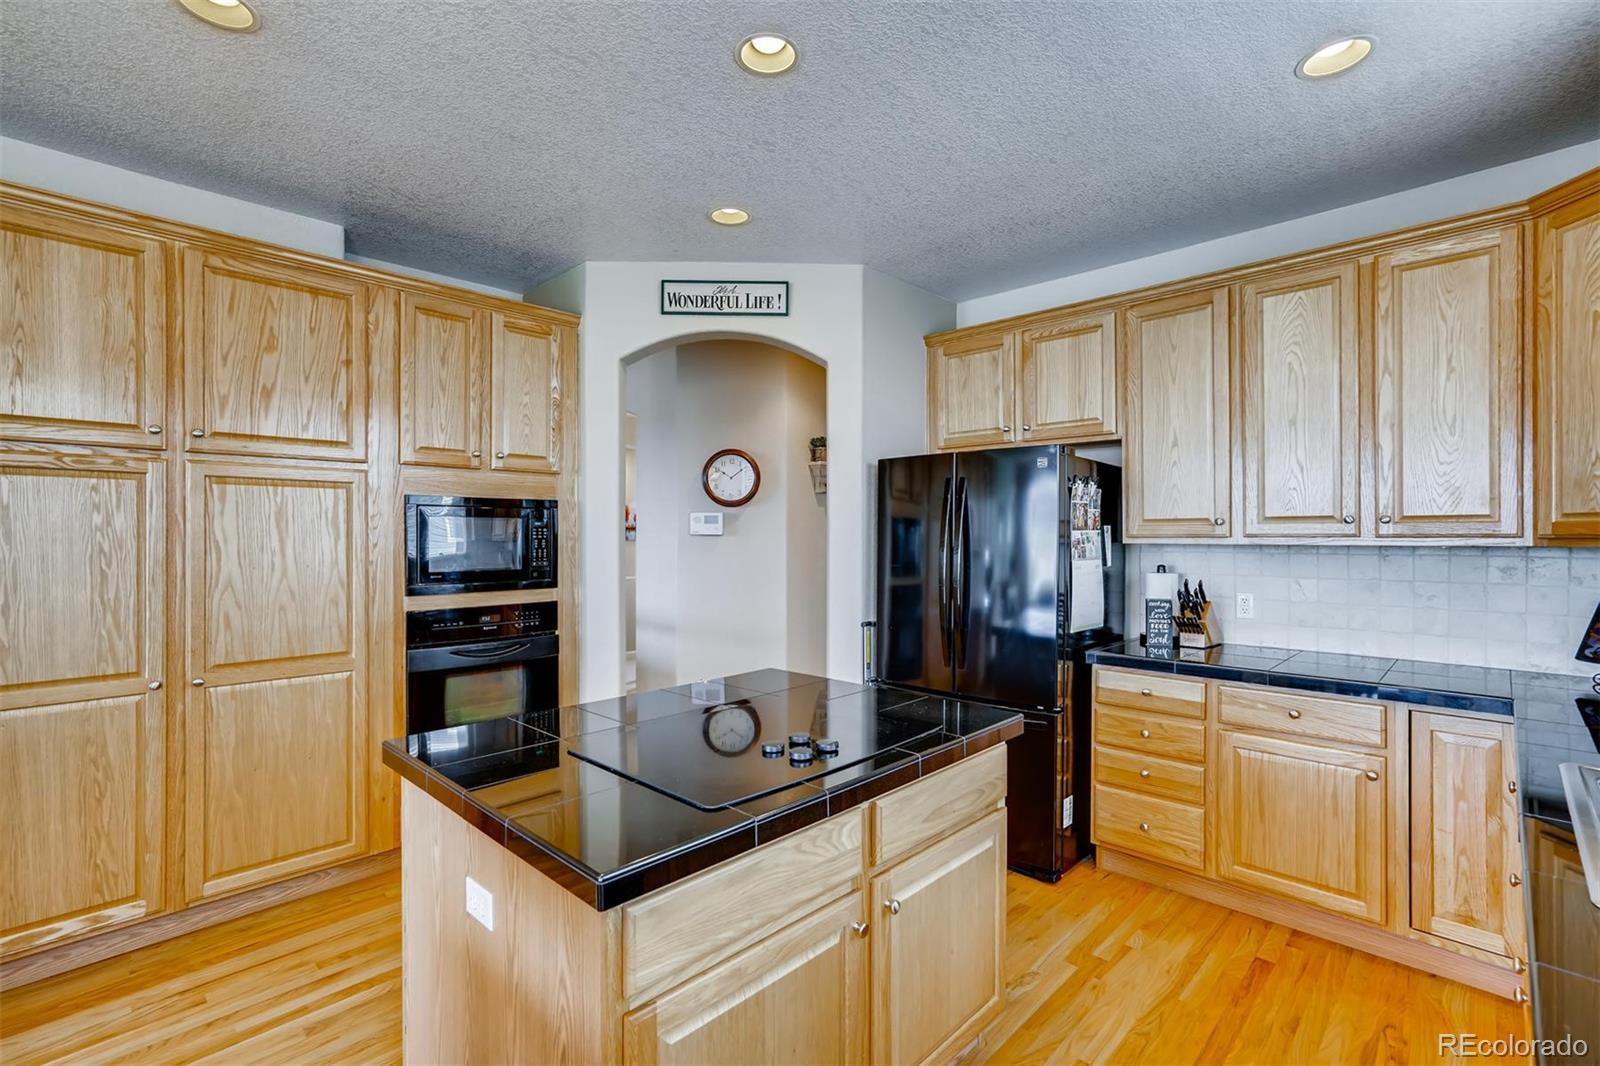 MLS# 8392036 - 7 - 8399 Winter Berry Drive, Castle Pines, CO 80108